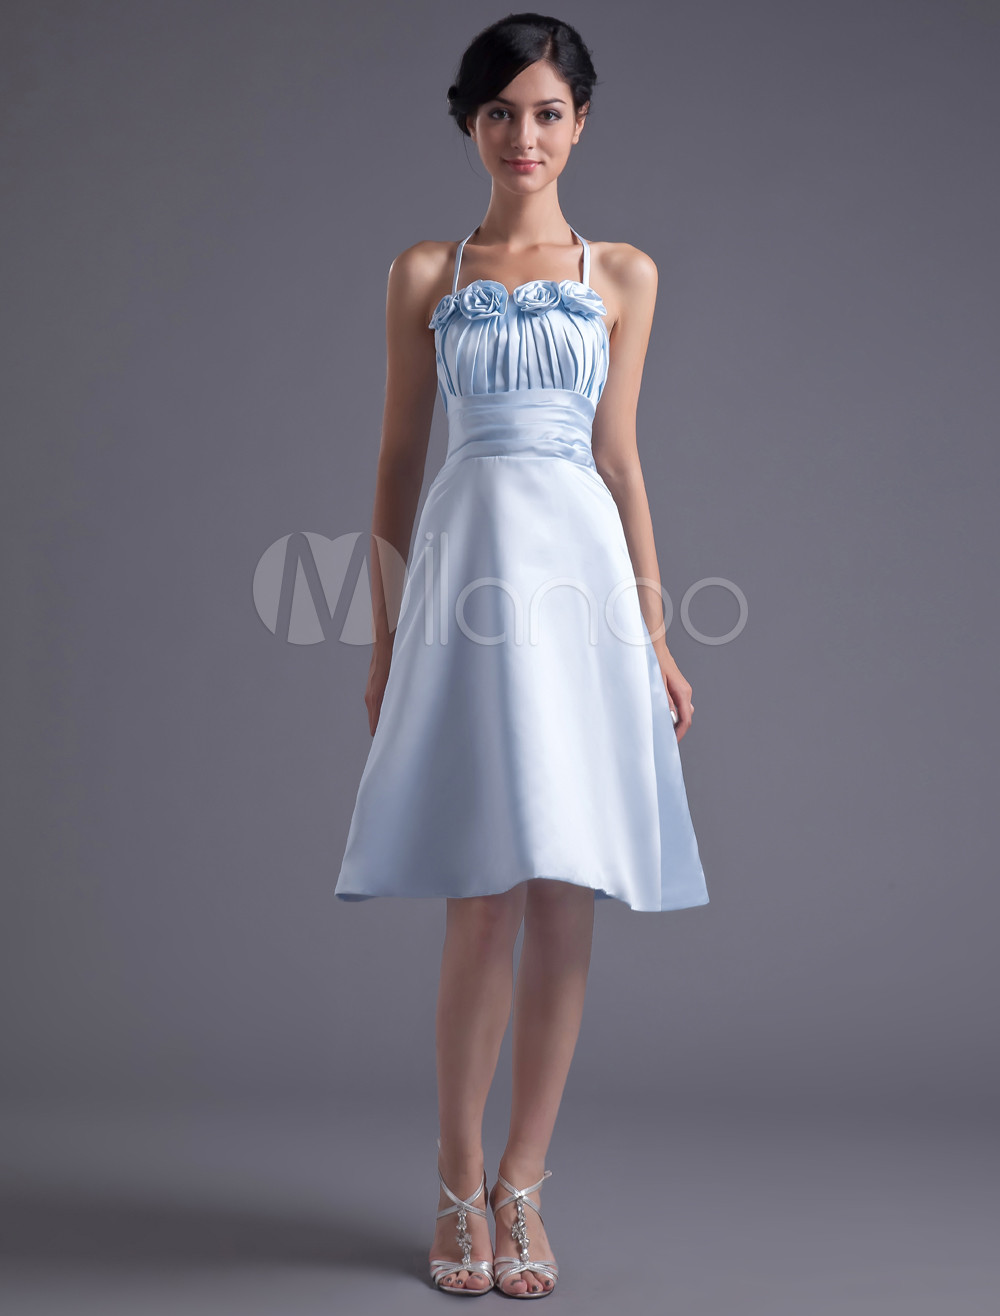 A-line Light Sky Blue Satin Floral Halter Knee-Length Fashion Bridesmaid Dress